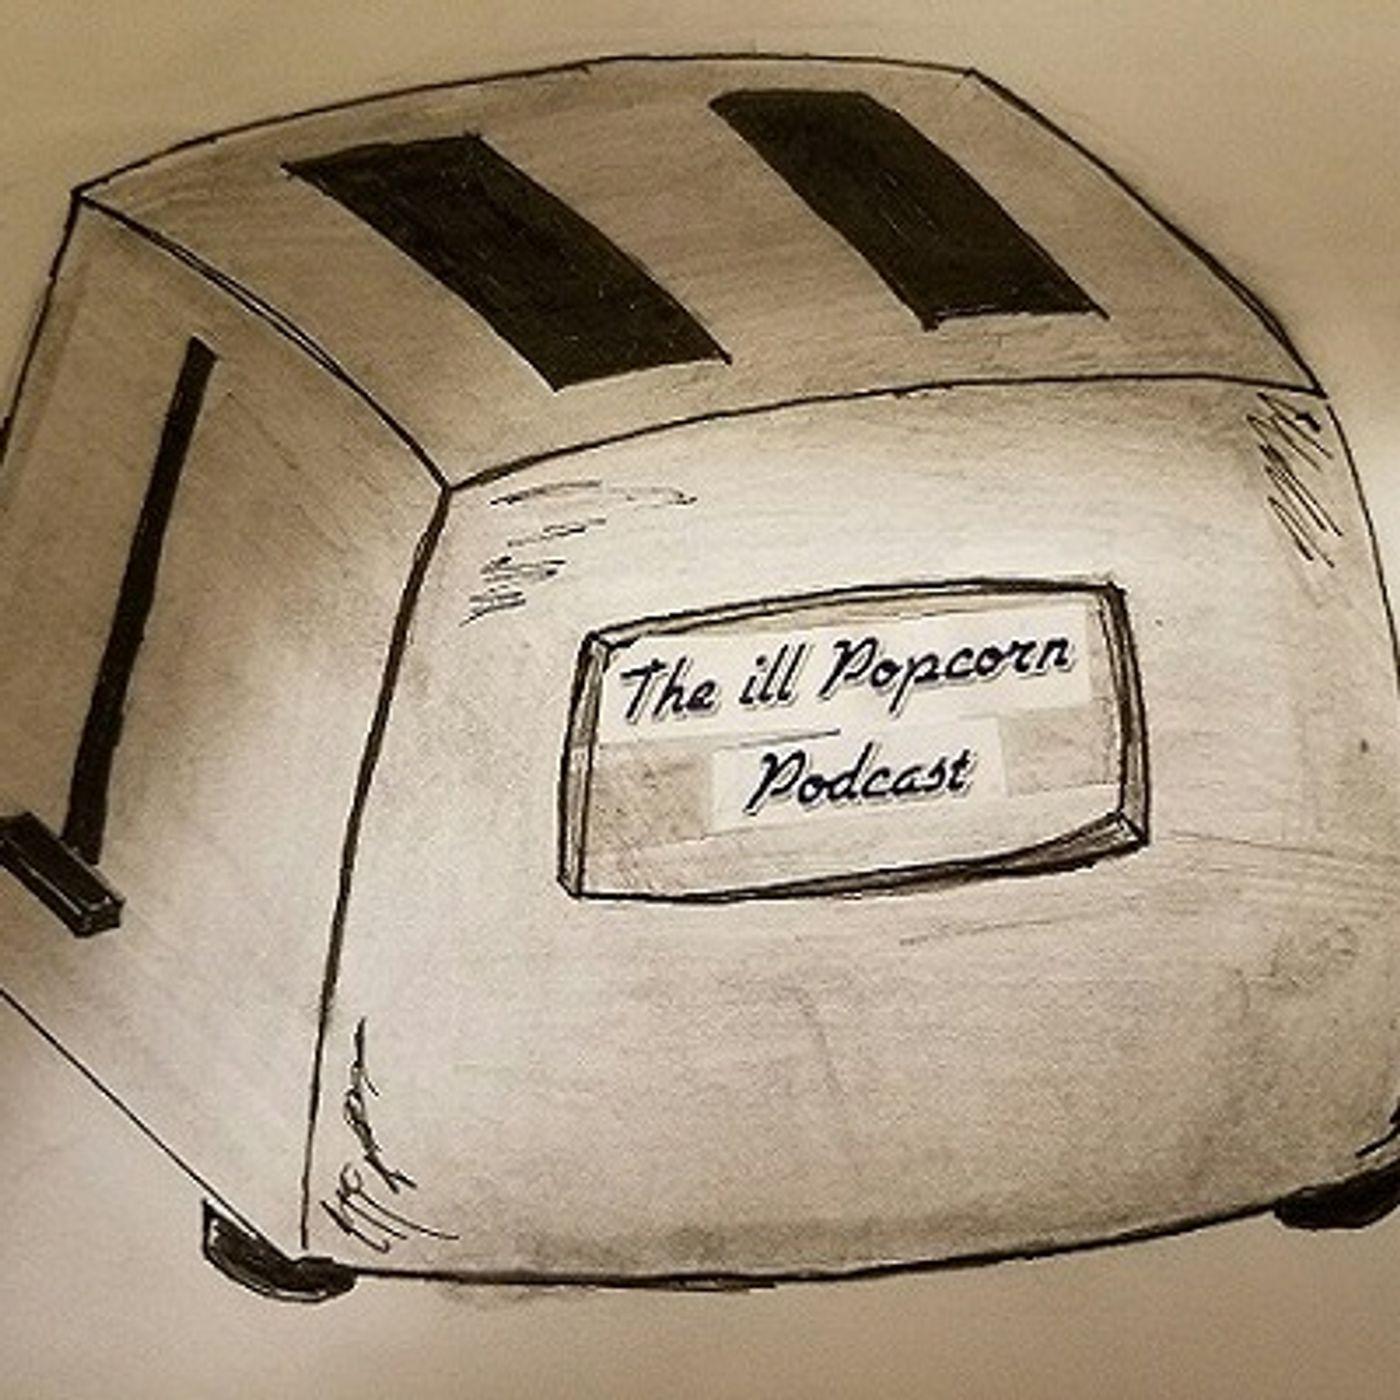 The ill Popcorn Podcast